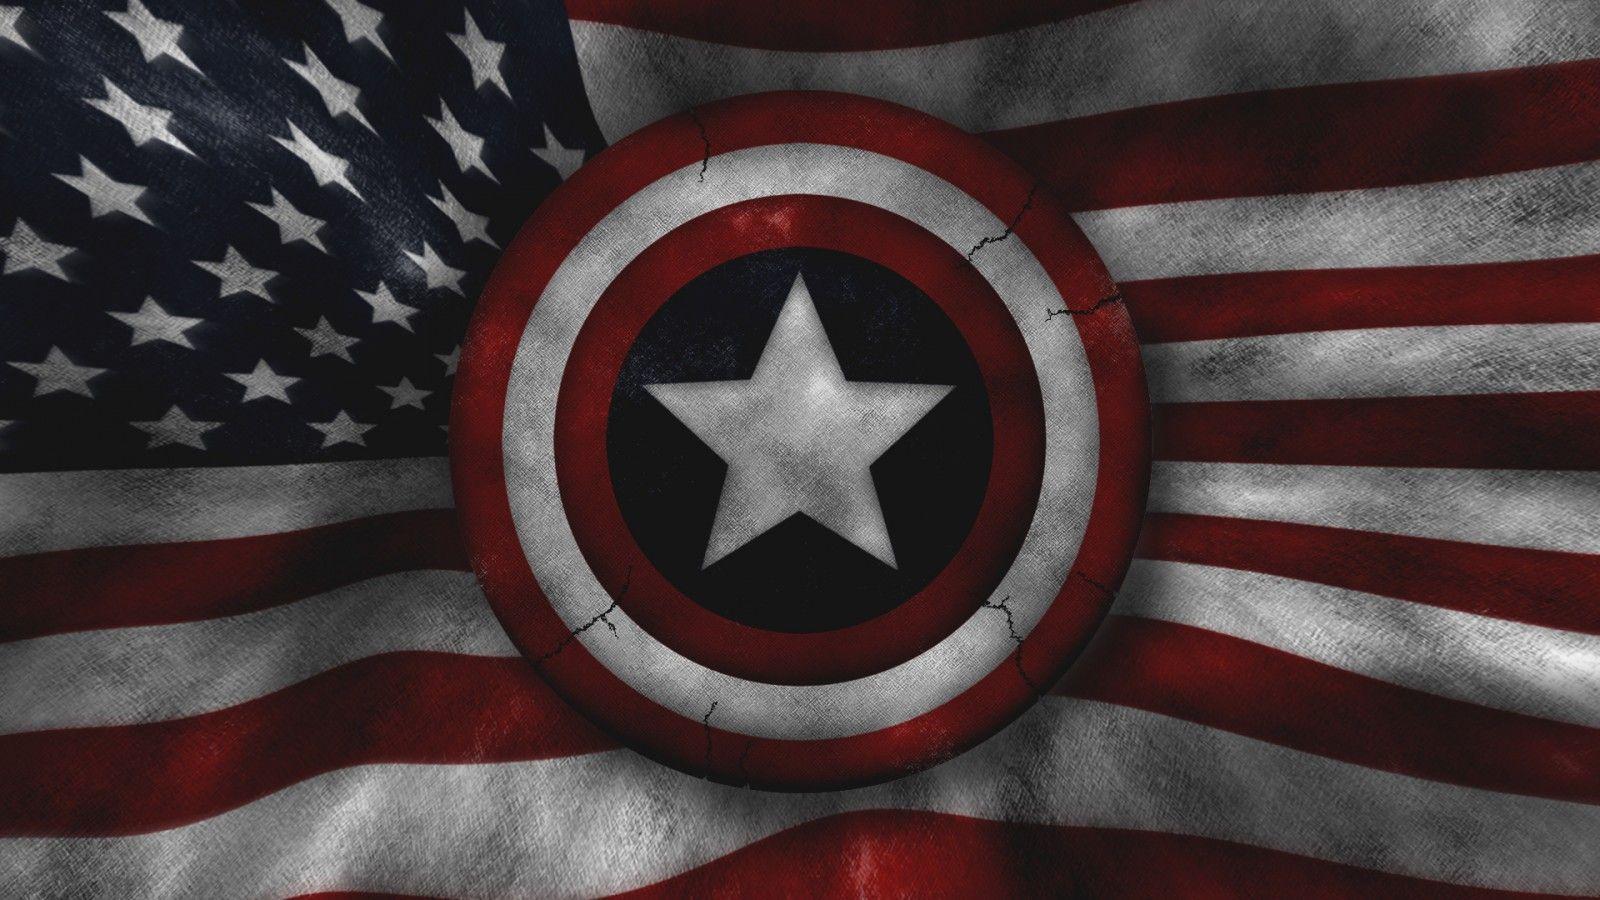 american flag with captin america Description